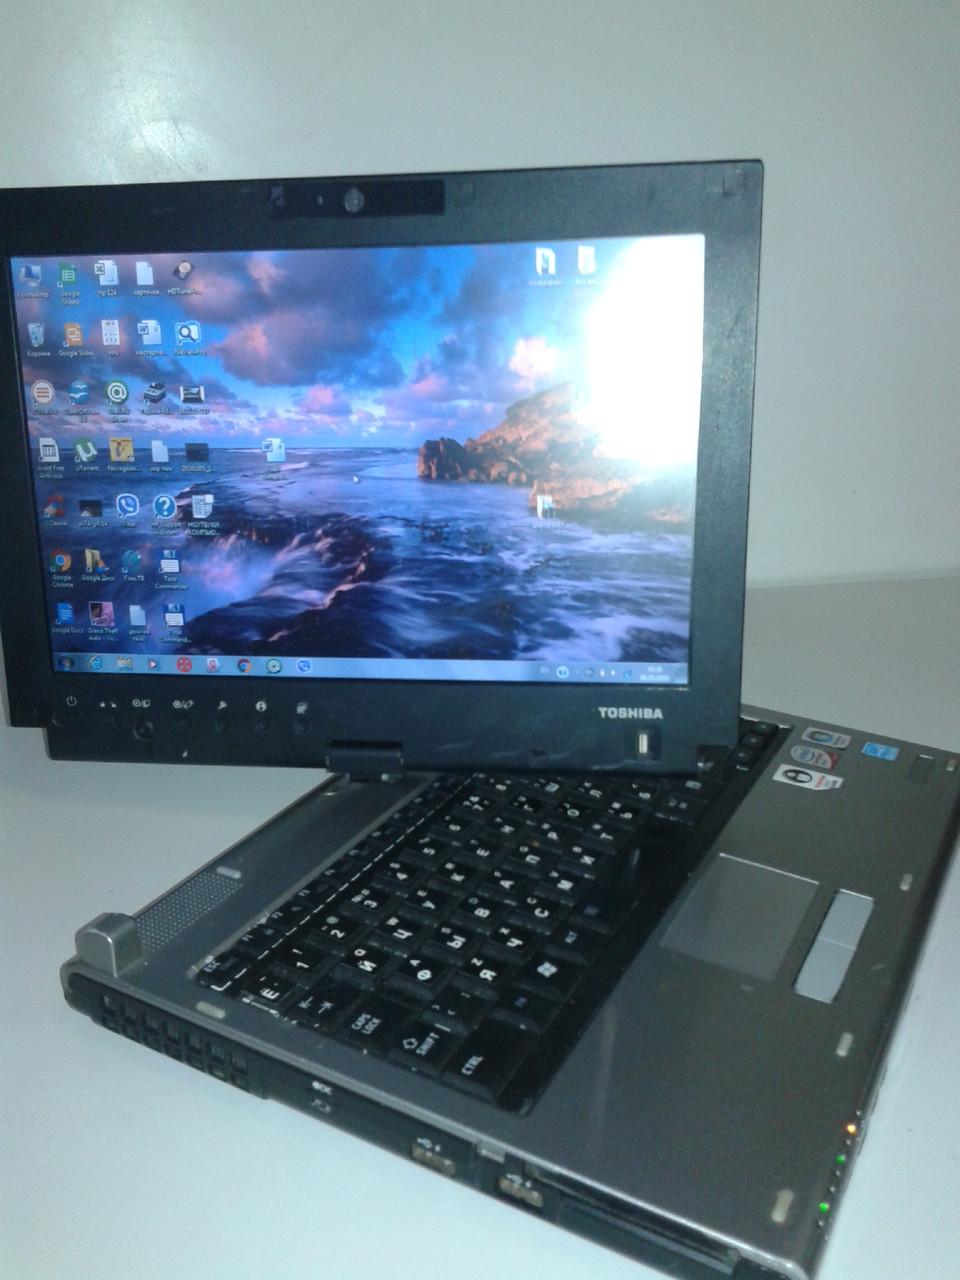 Трансформер-ноутбук\планшет Toshiba m700 3G модем\вебкамера